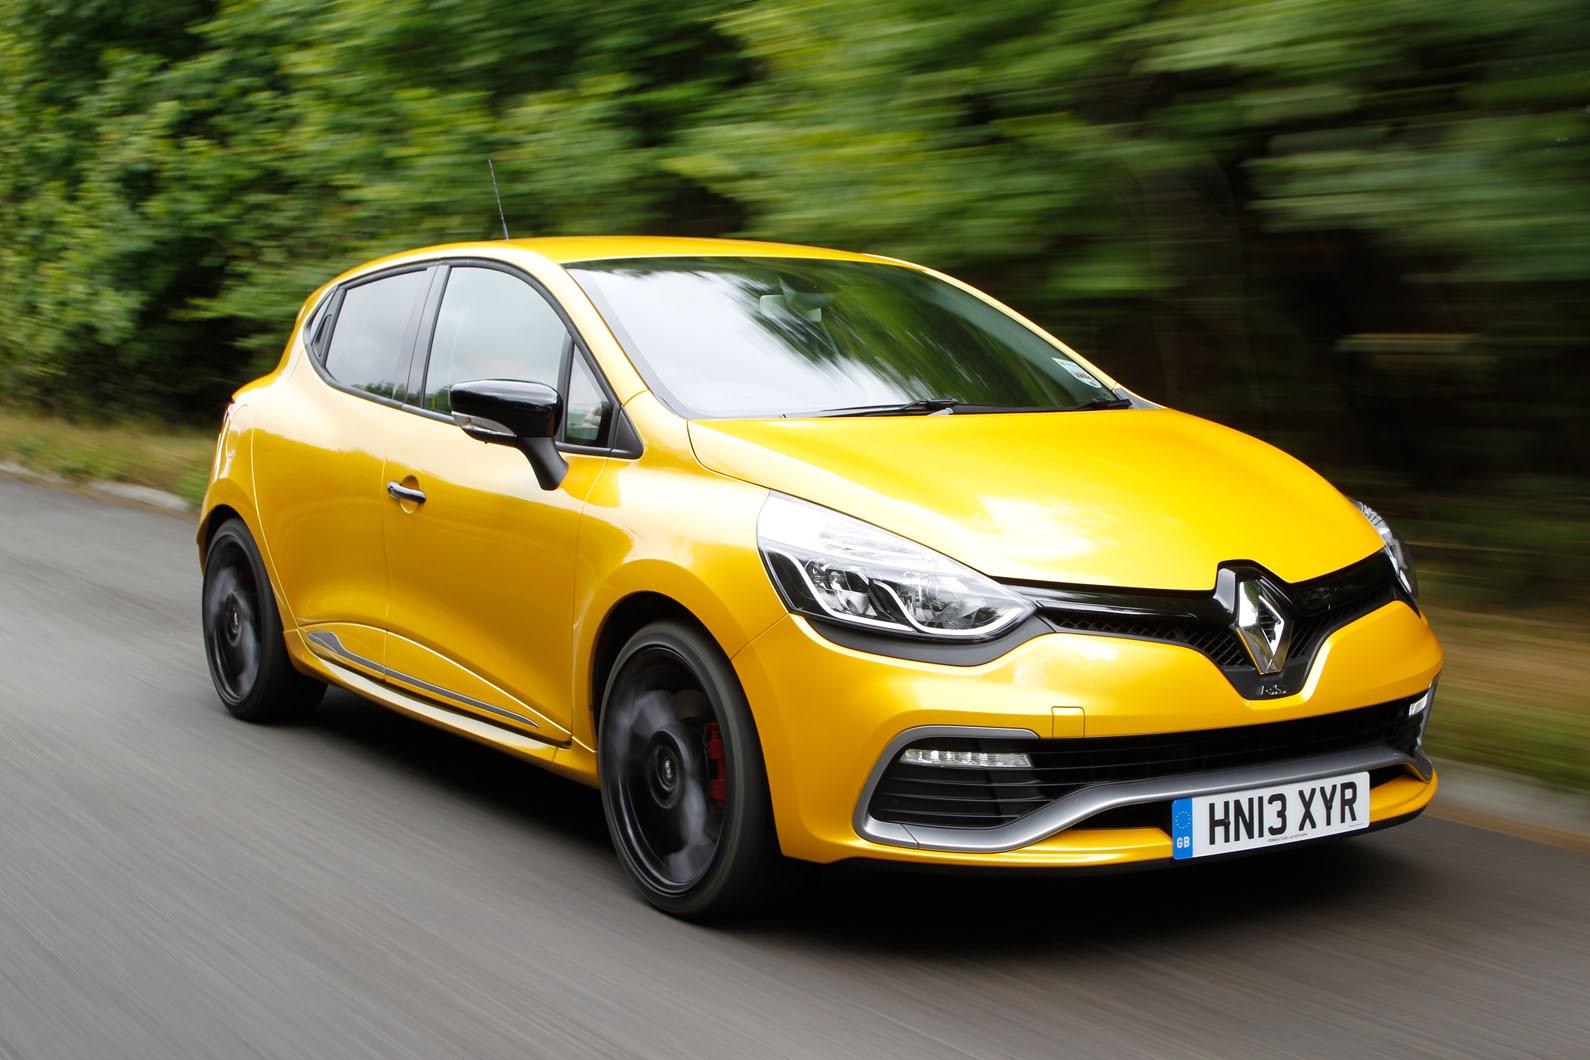 Renault Clio Renaultsport 2013 2016 Review 2021 Autocar